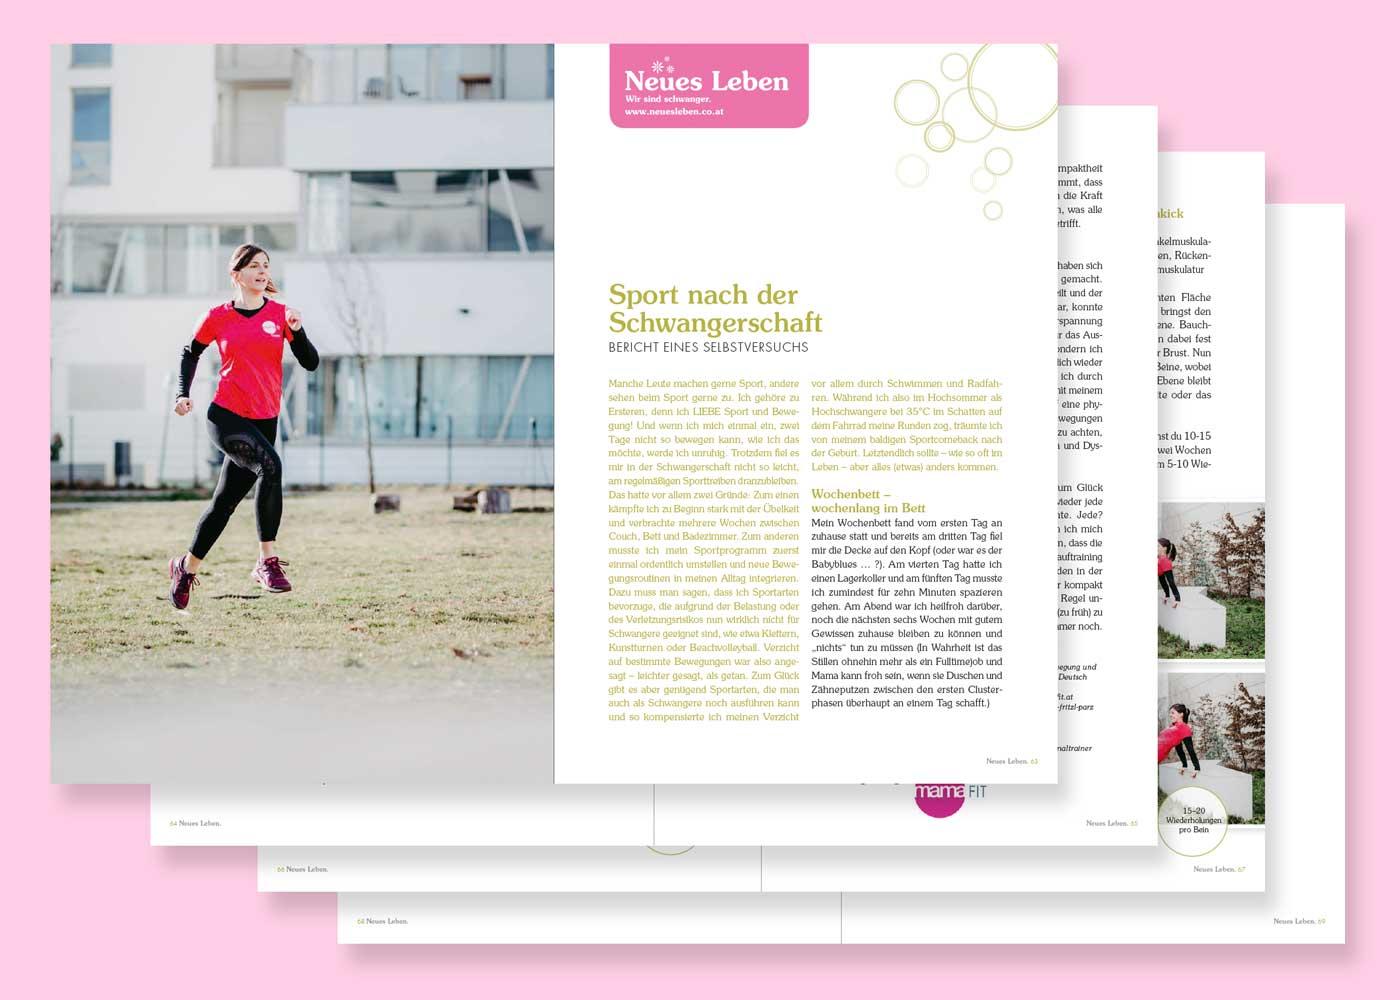 Sport nach der Schwangerschaft – Neues Leben